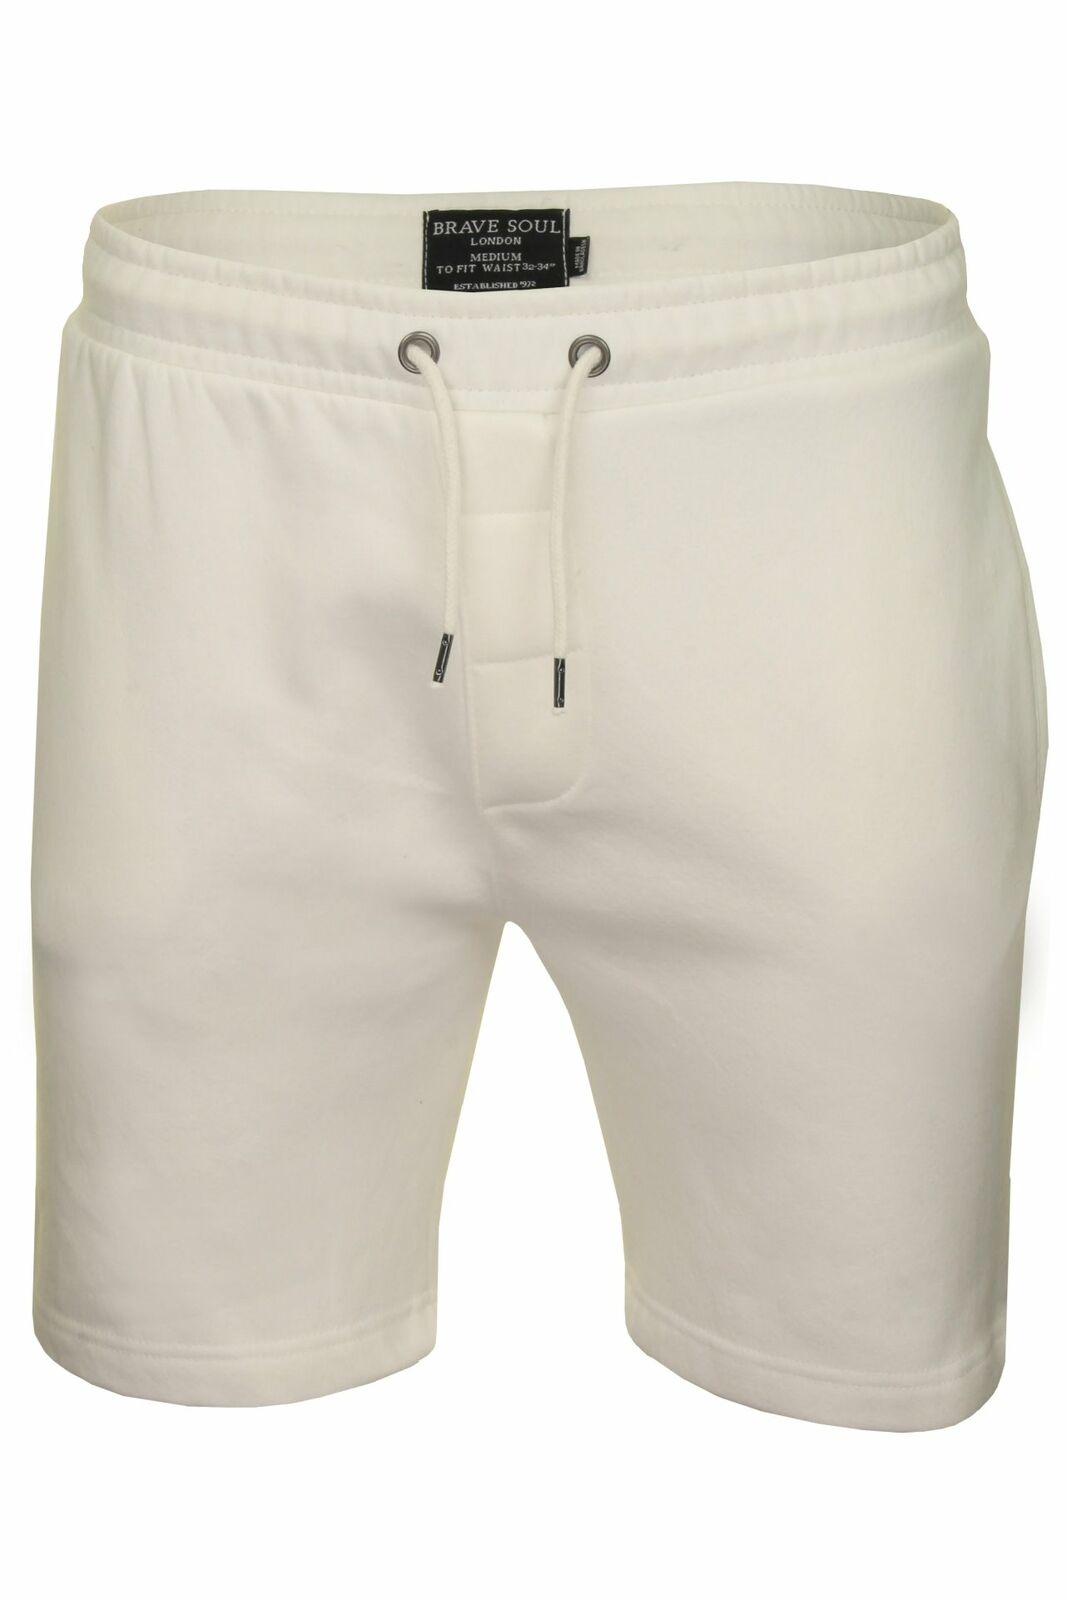 Mens-Jogger-Shorts-Tarley-by-Brave-Soul-Knee-Length-Casual-Fleece-Lined-Summer thumbnail 30